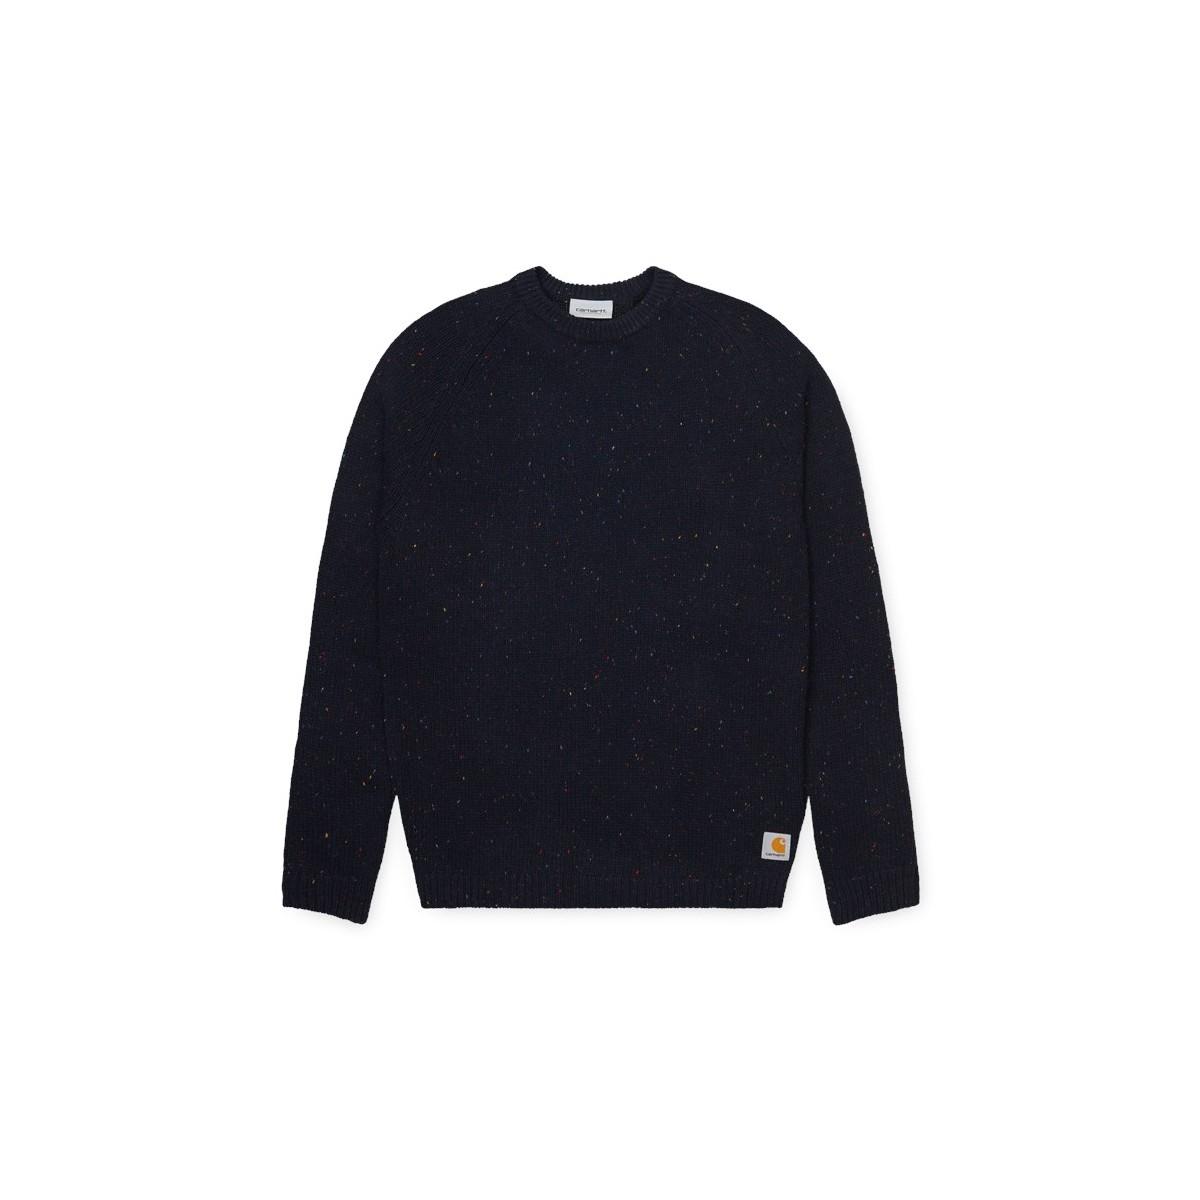 Carhartt WIP - Pull en laine bleu marine moucheté